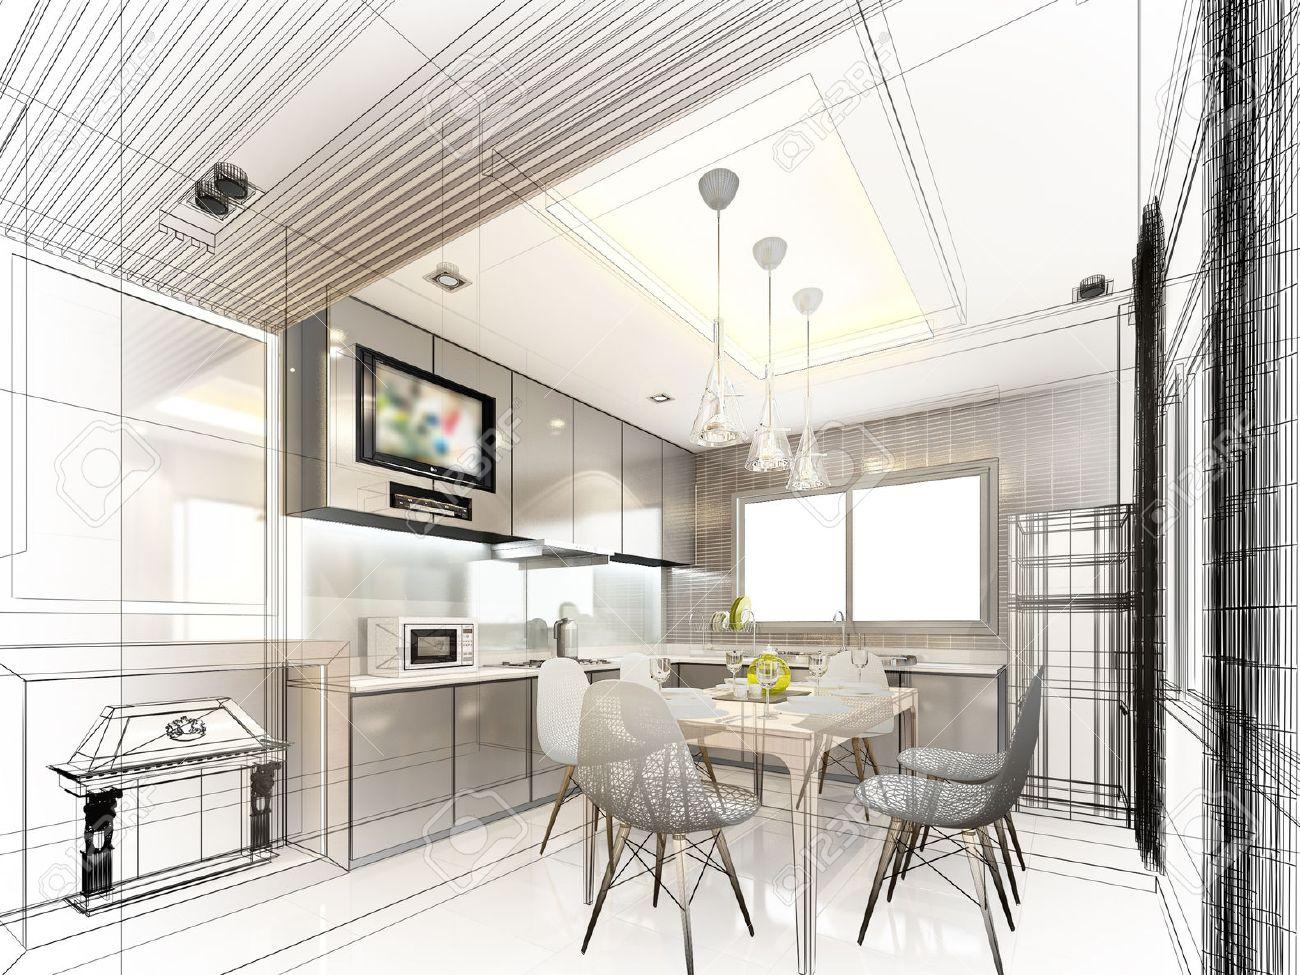 abstract sketch design of interior kitchen - 40904822